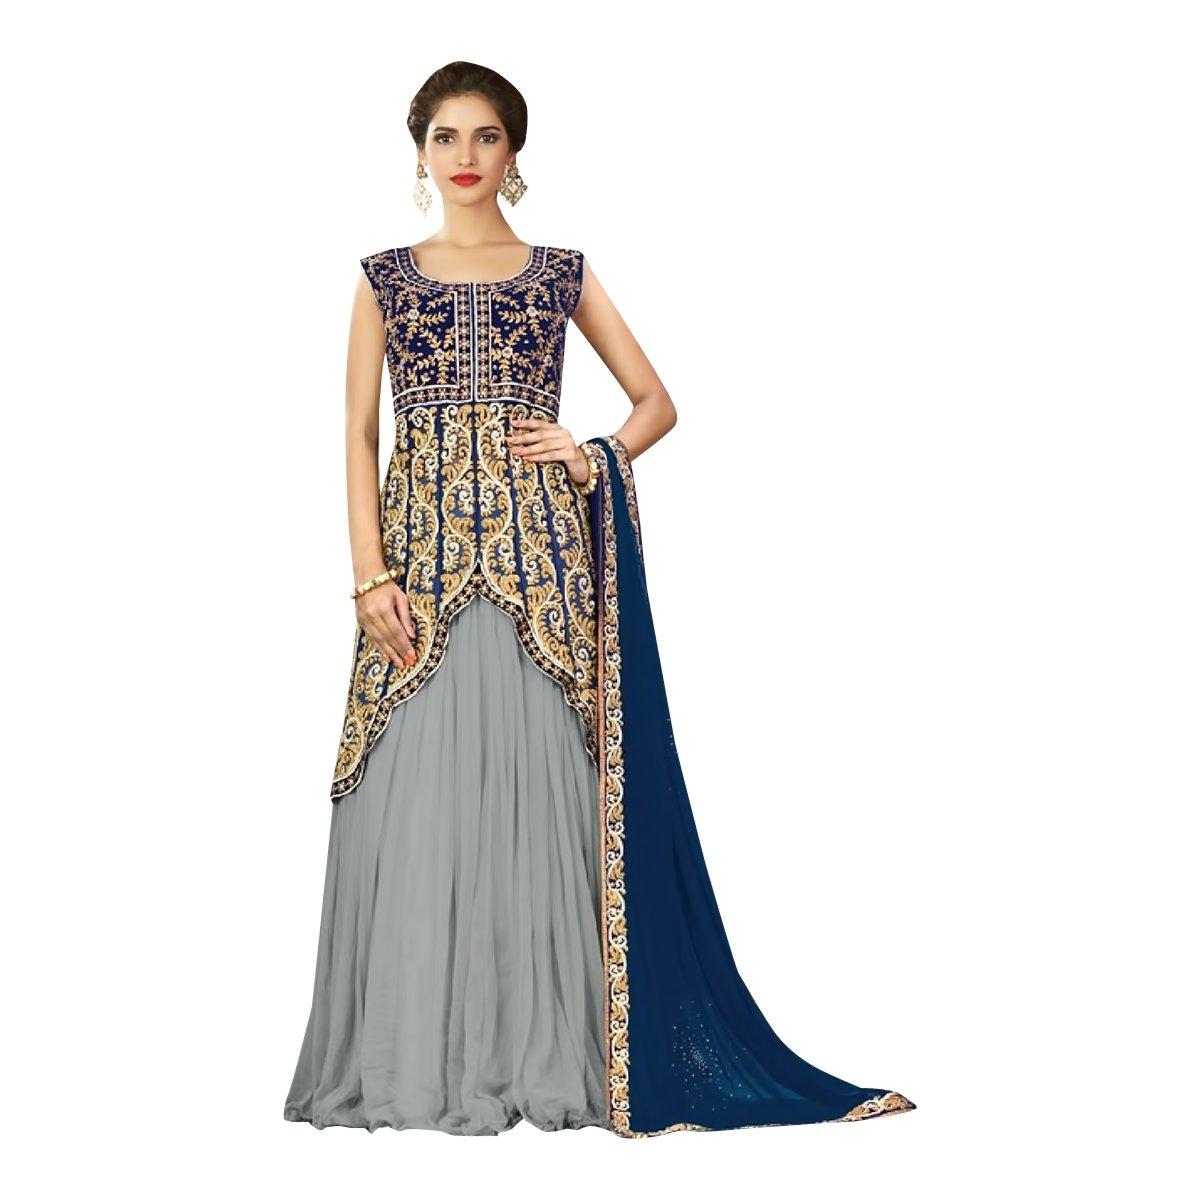 ea6cfa1de7c Amazon.com  Just Launch Bridal Bollywood Lehenga Choli Dupatta Party  Wedding Wear Women Ceremony Festival By Ethnic Emporium 502  Clothing